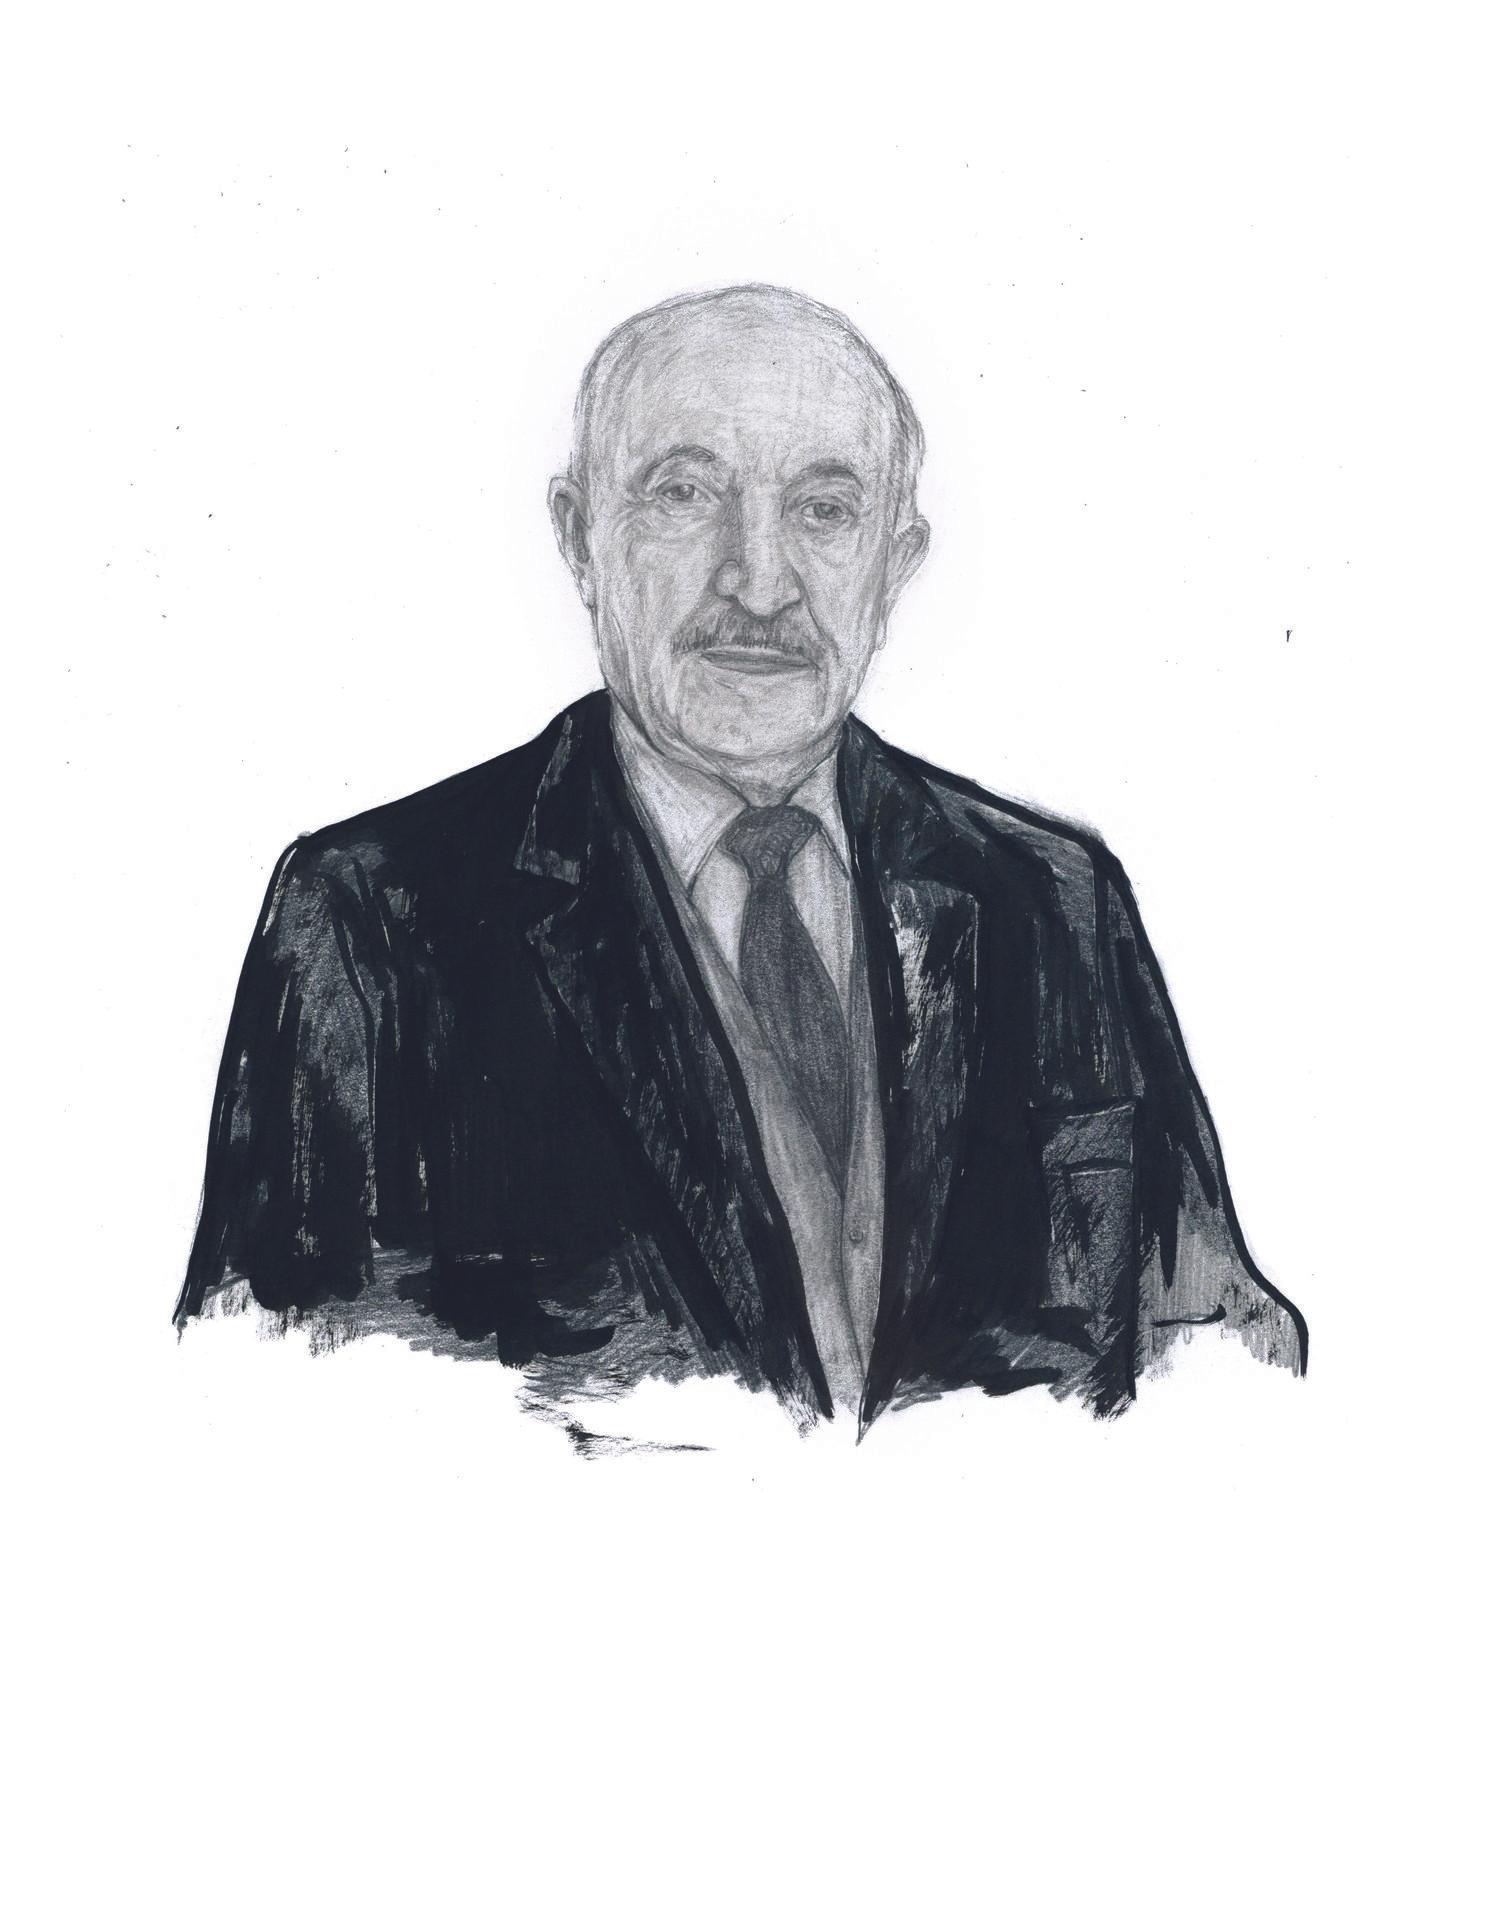 Simon Wiesentha